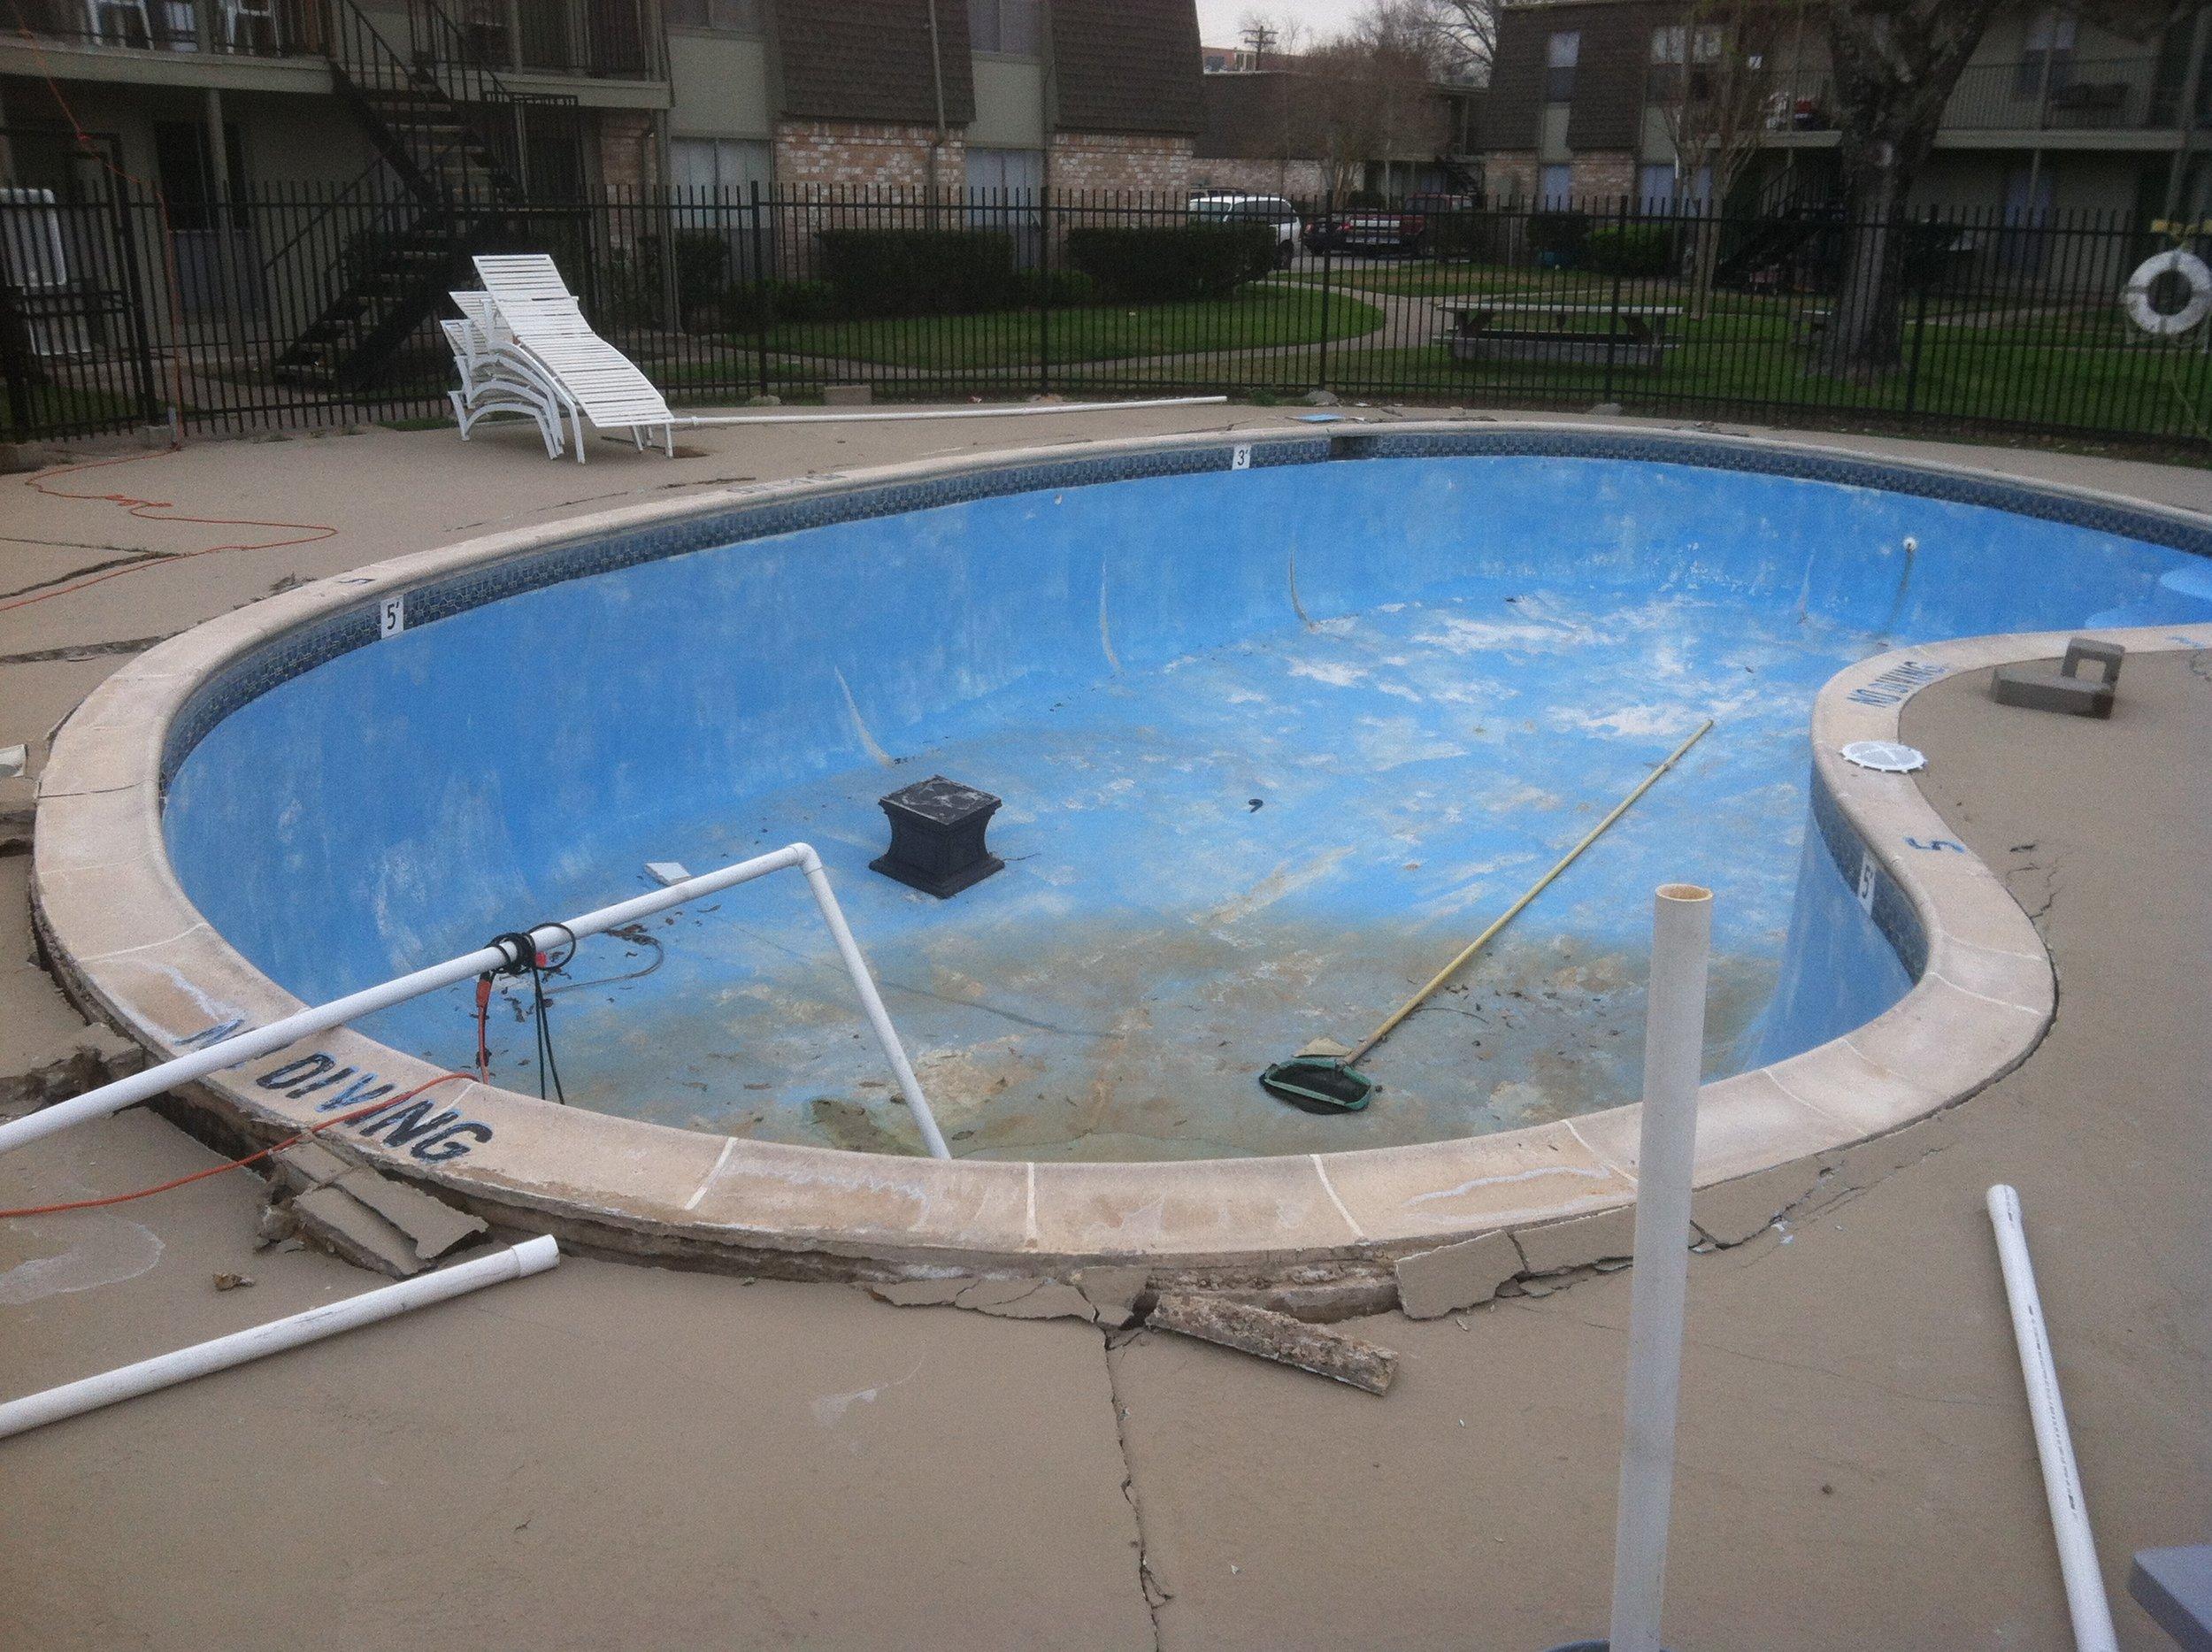 pool-plumbing-project-4.jpg